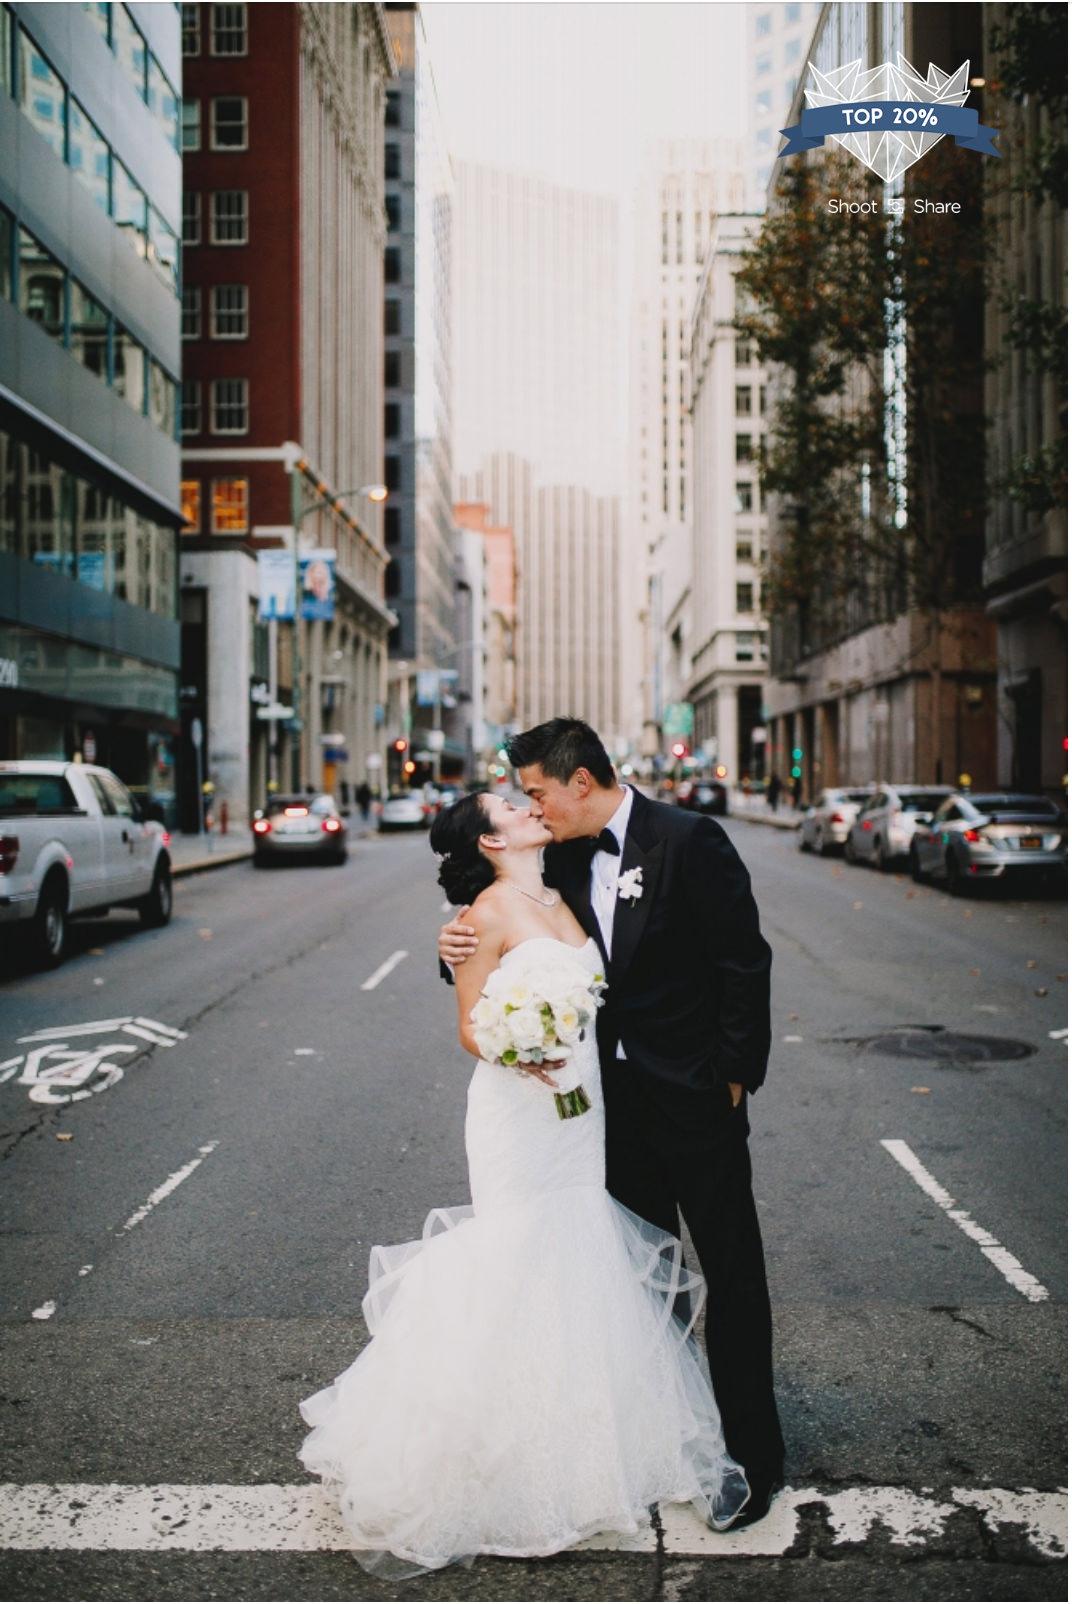 Archer Inspired Photography Shoot and Share Family Wedding Lifestyle Photographer Morgan Hill California San Francisco Bay Area-7.jpg